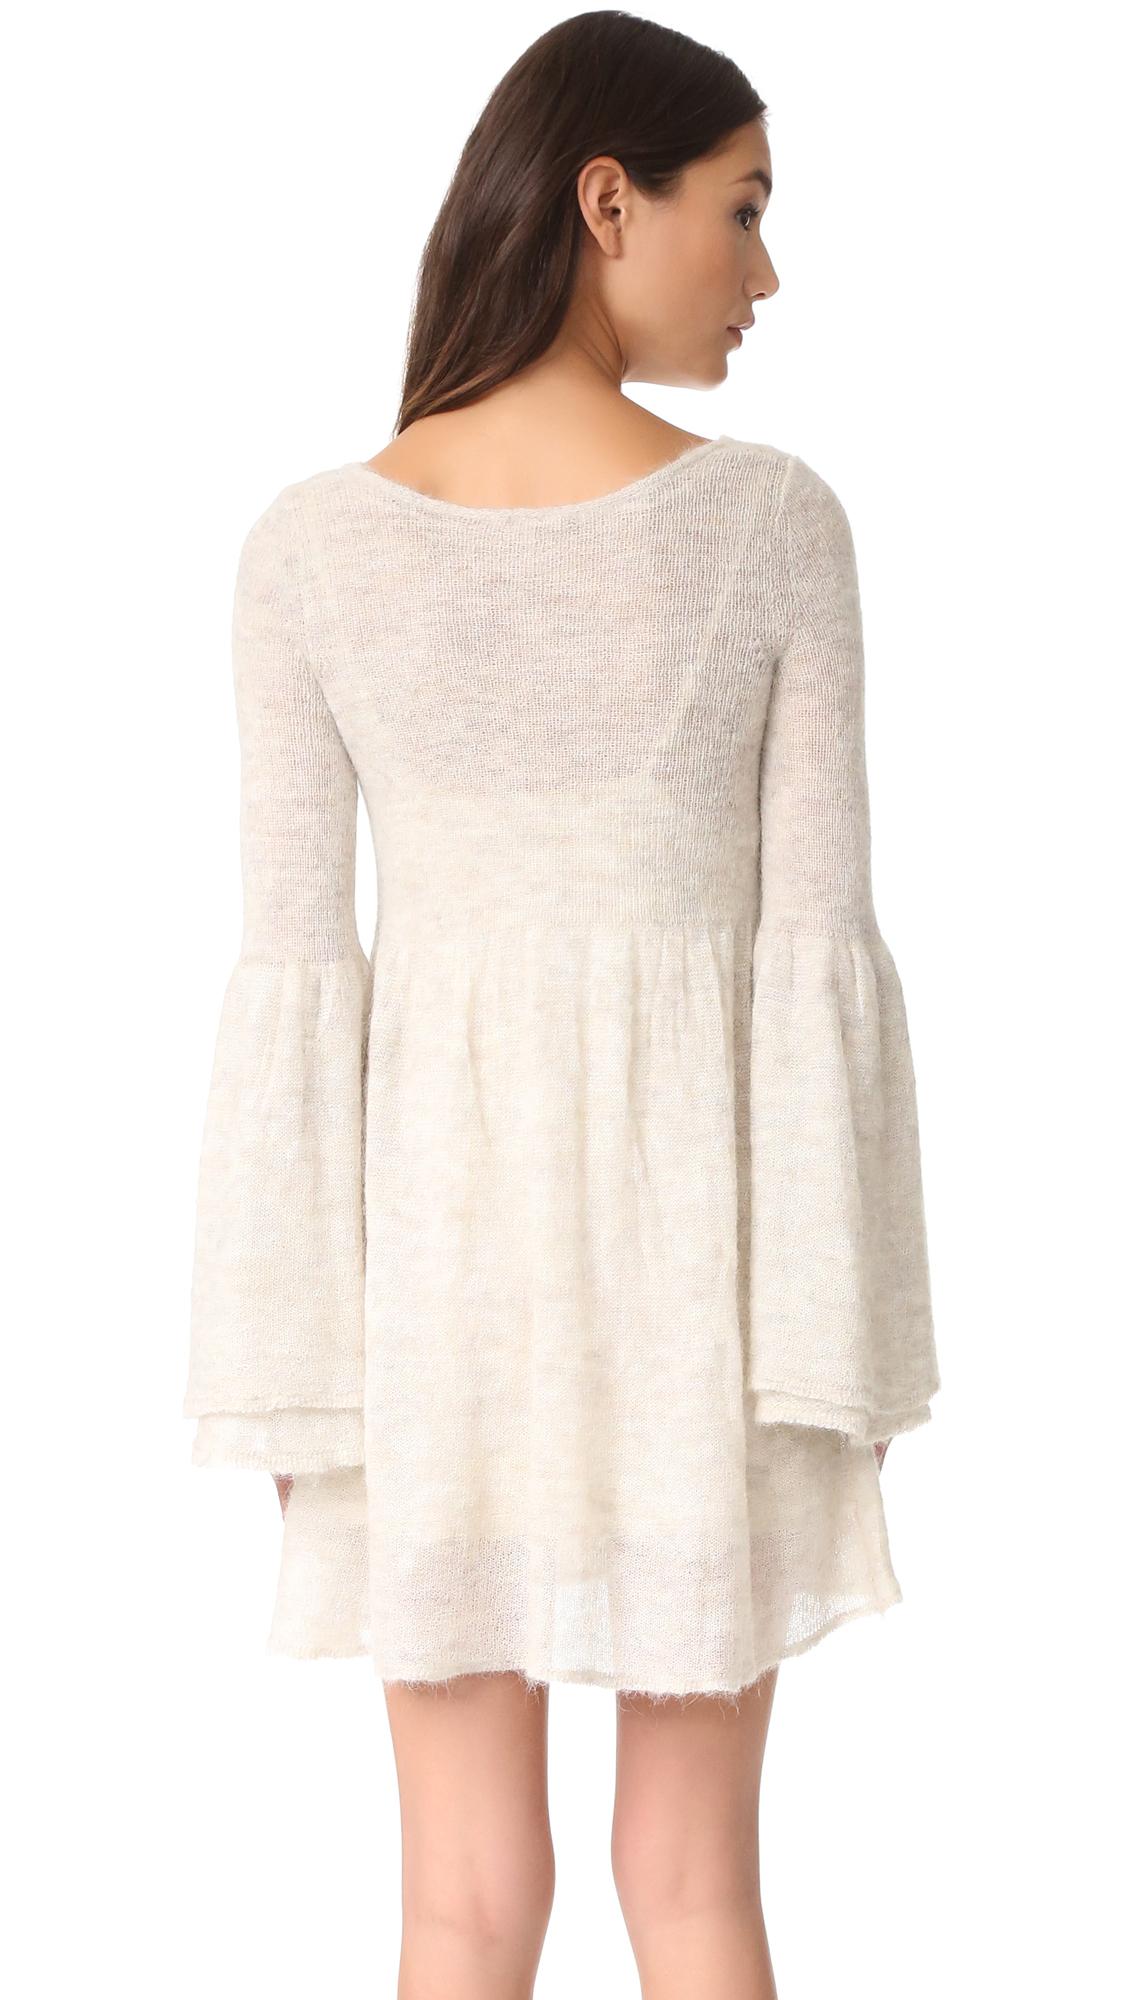 a40e418af36485 Free People Juliet Babydoll Sweater Dress